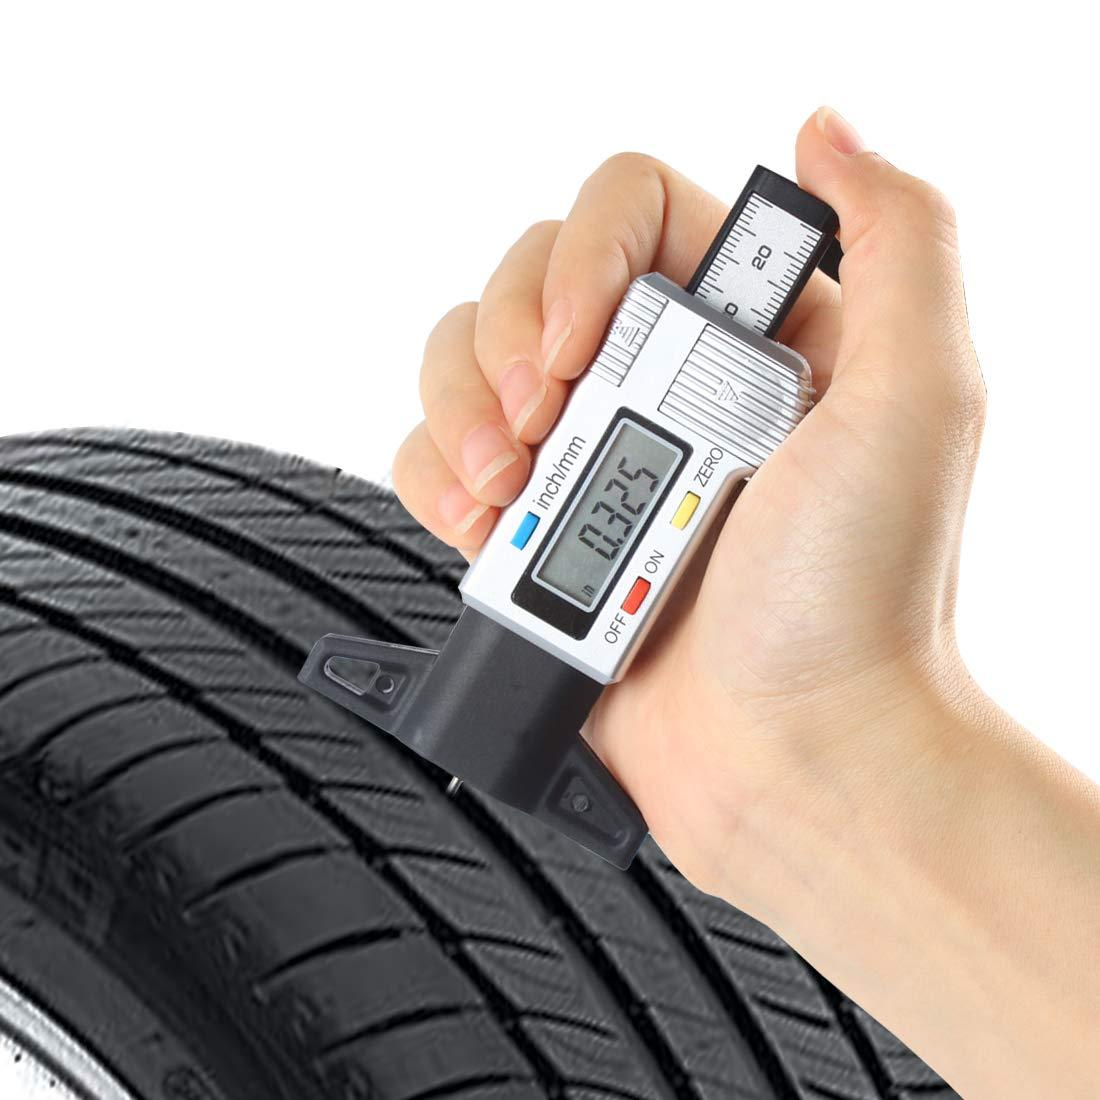 Andux Zone Digital Tire Tread Depth Checker Tire Tester Gauge Measurer for Cars LTC-01 Silver